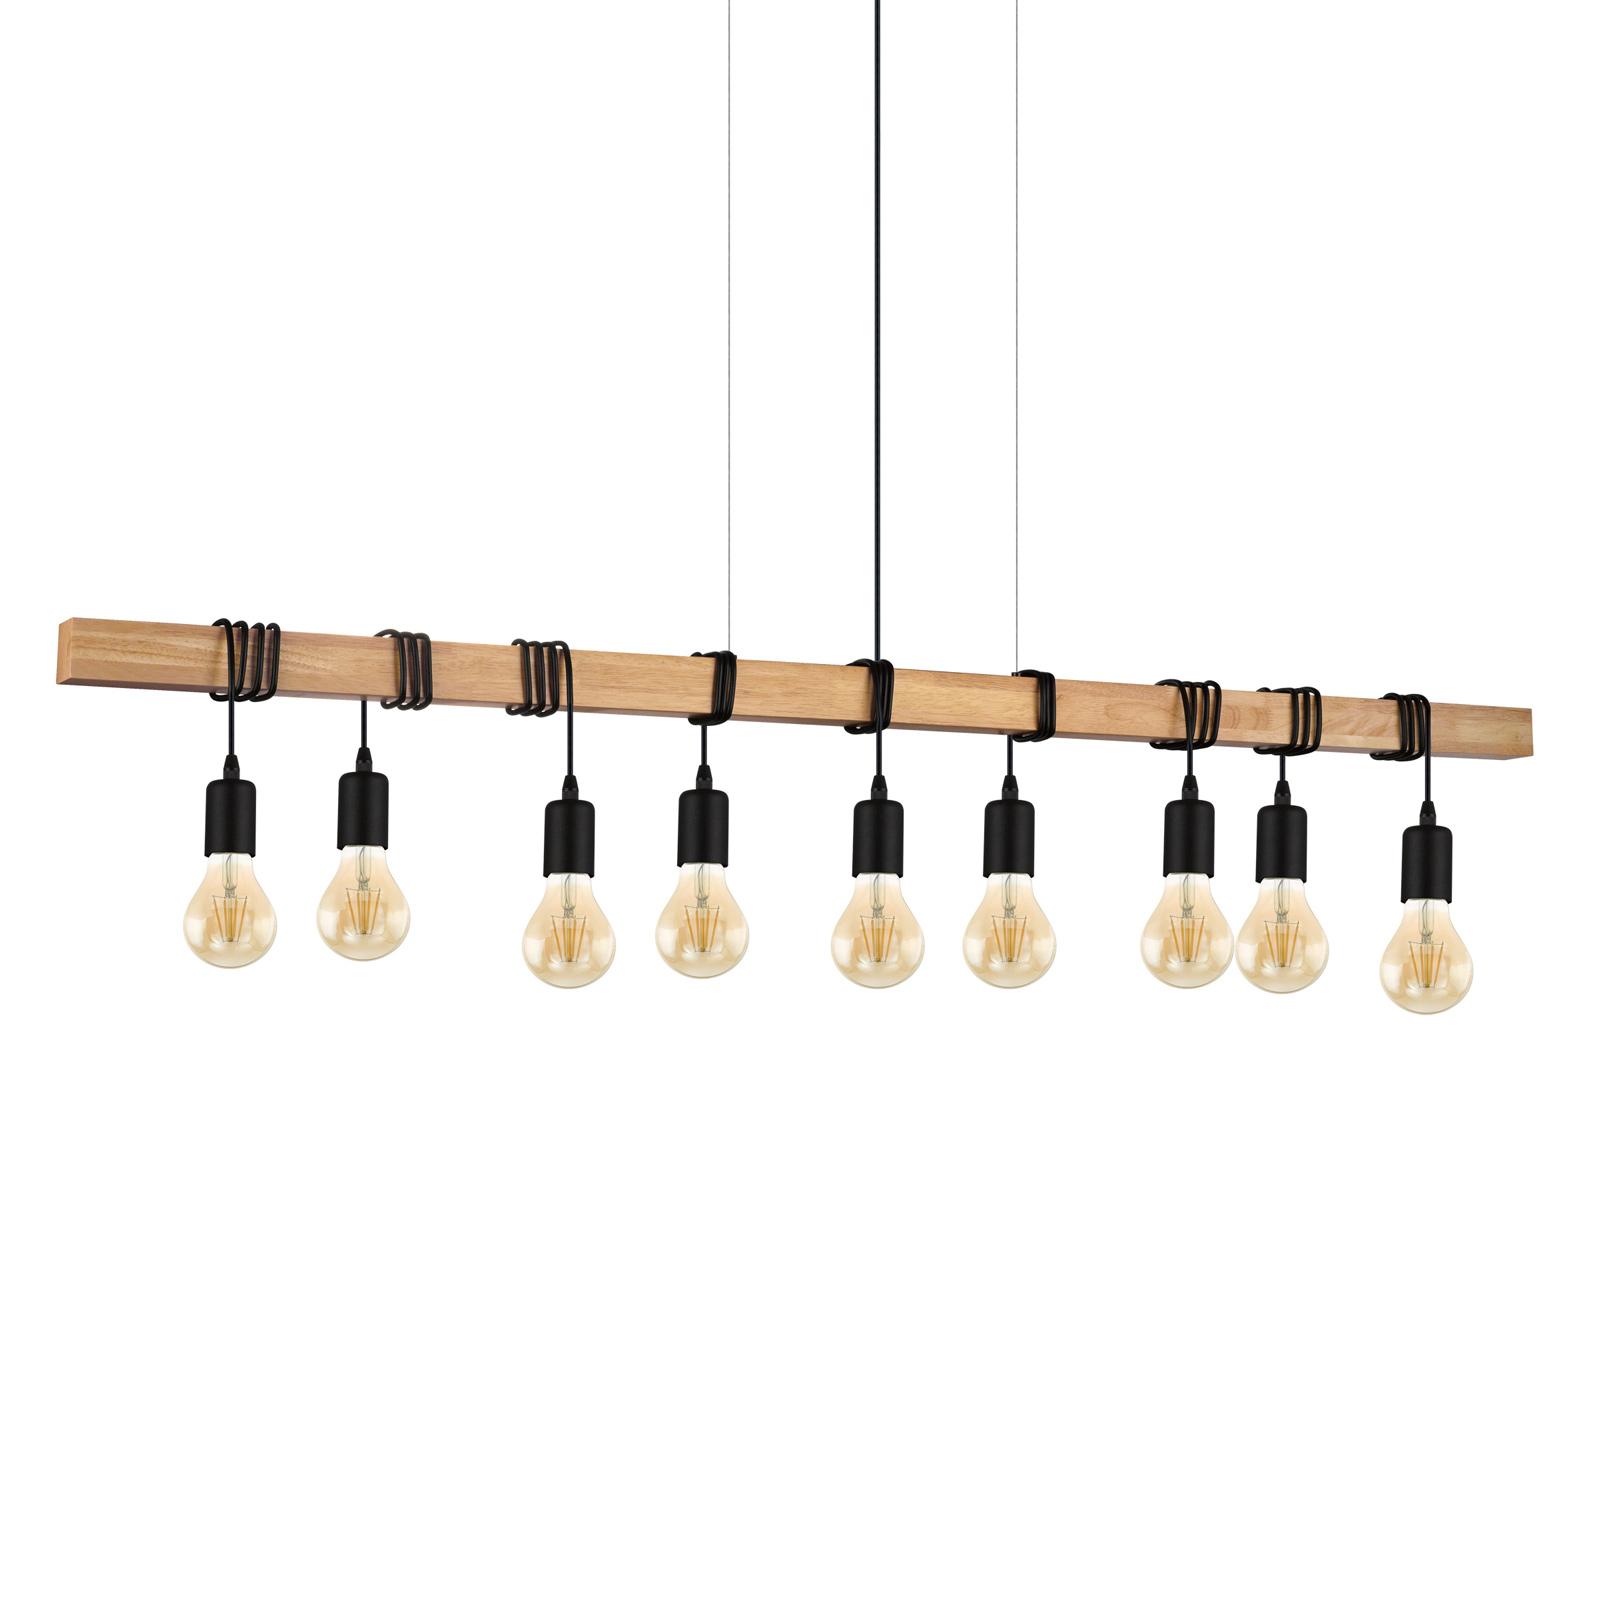 Hanglamp Townshend met hout, 9-lamps